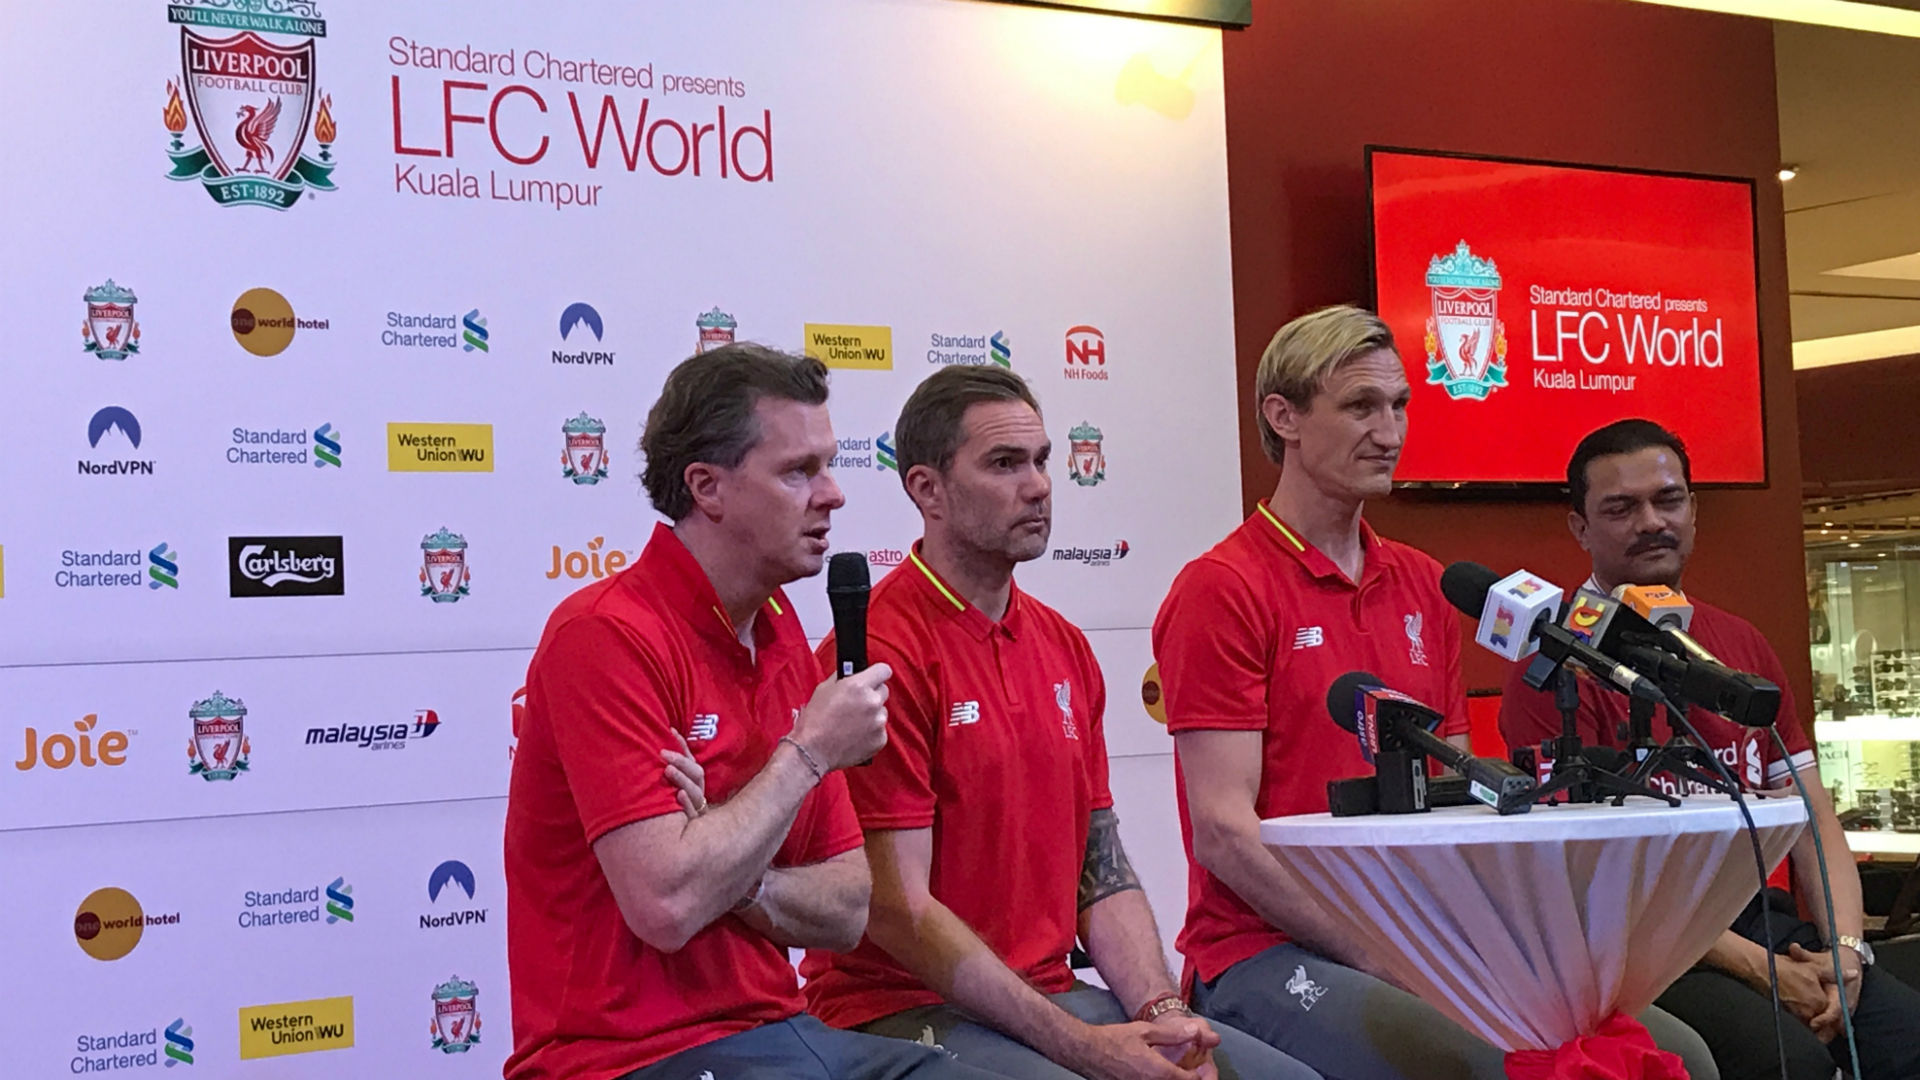 Steve McManaman, Liverpool, LFC World tour